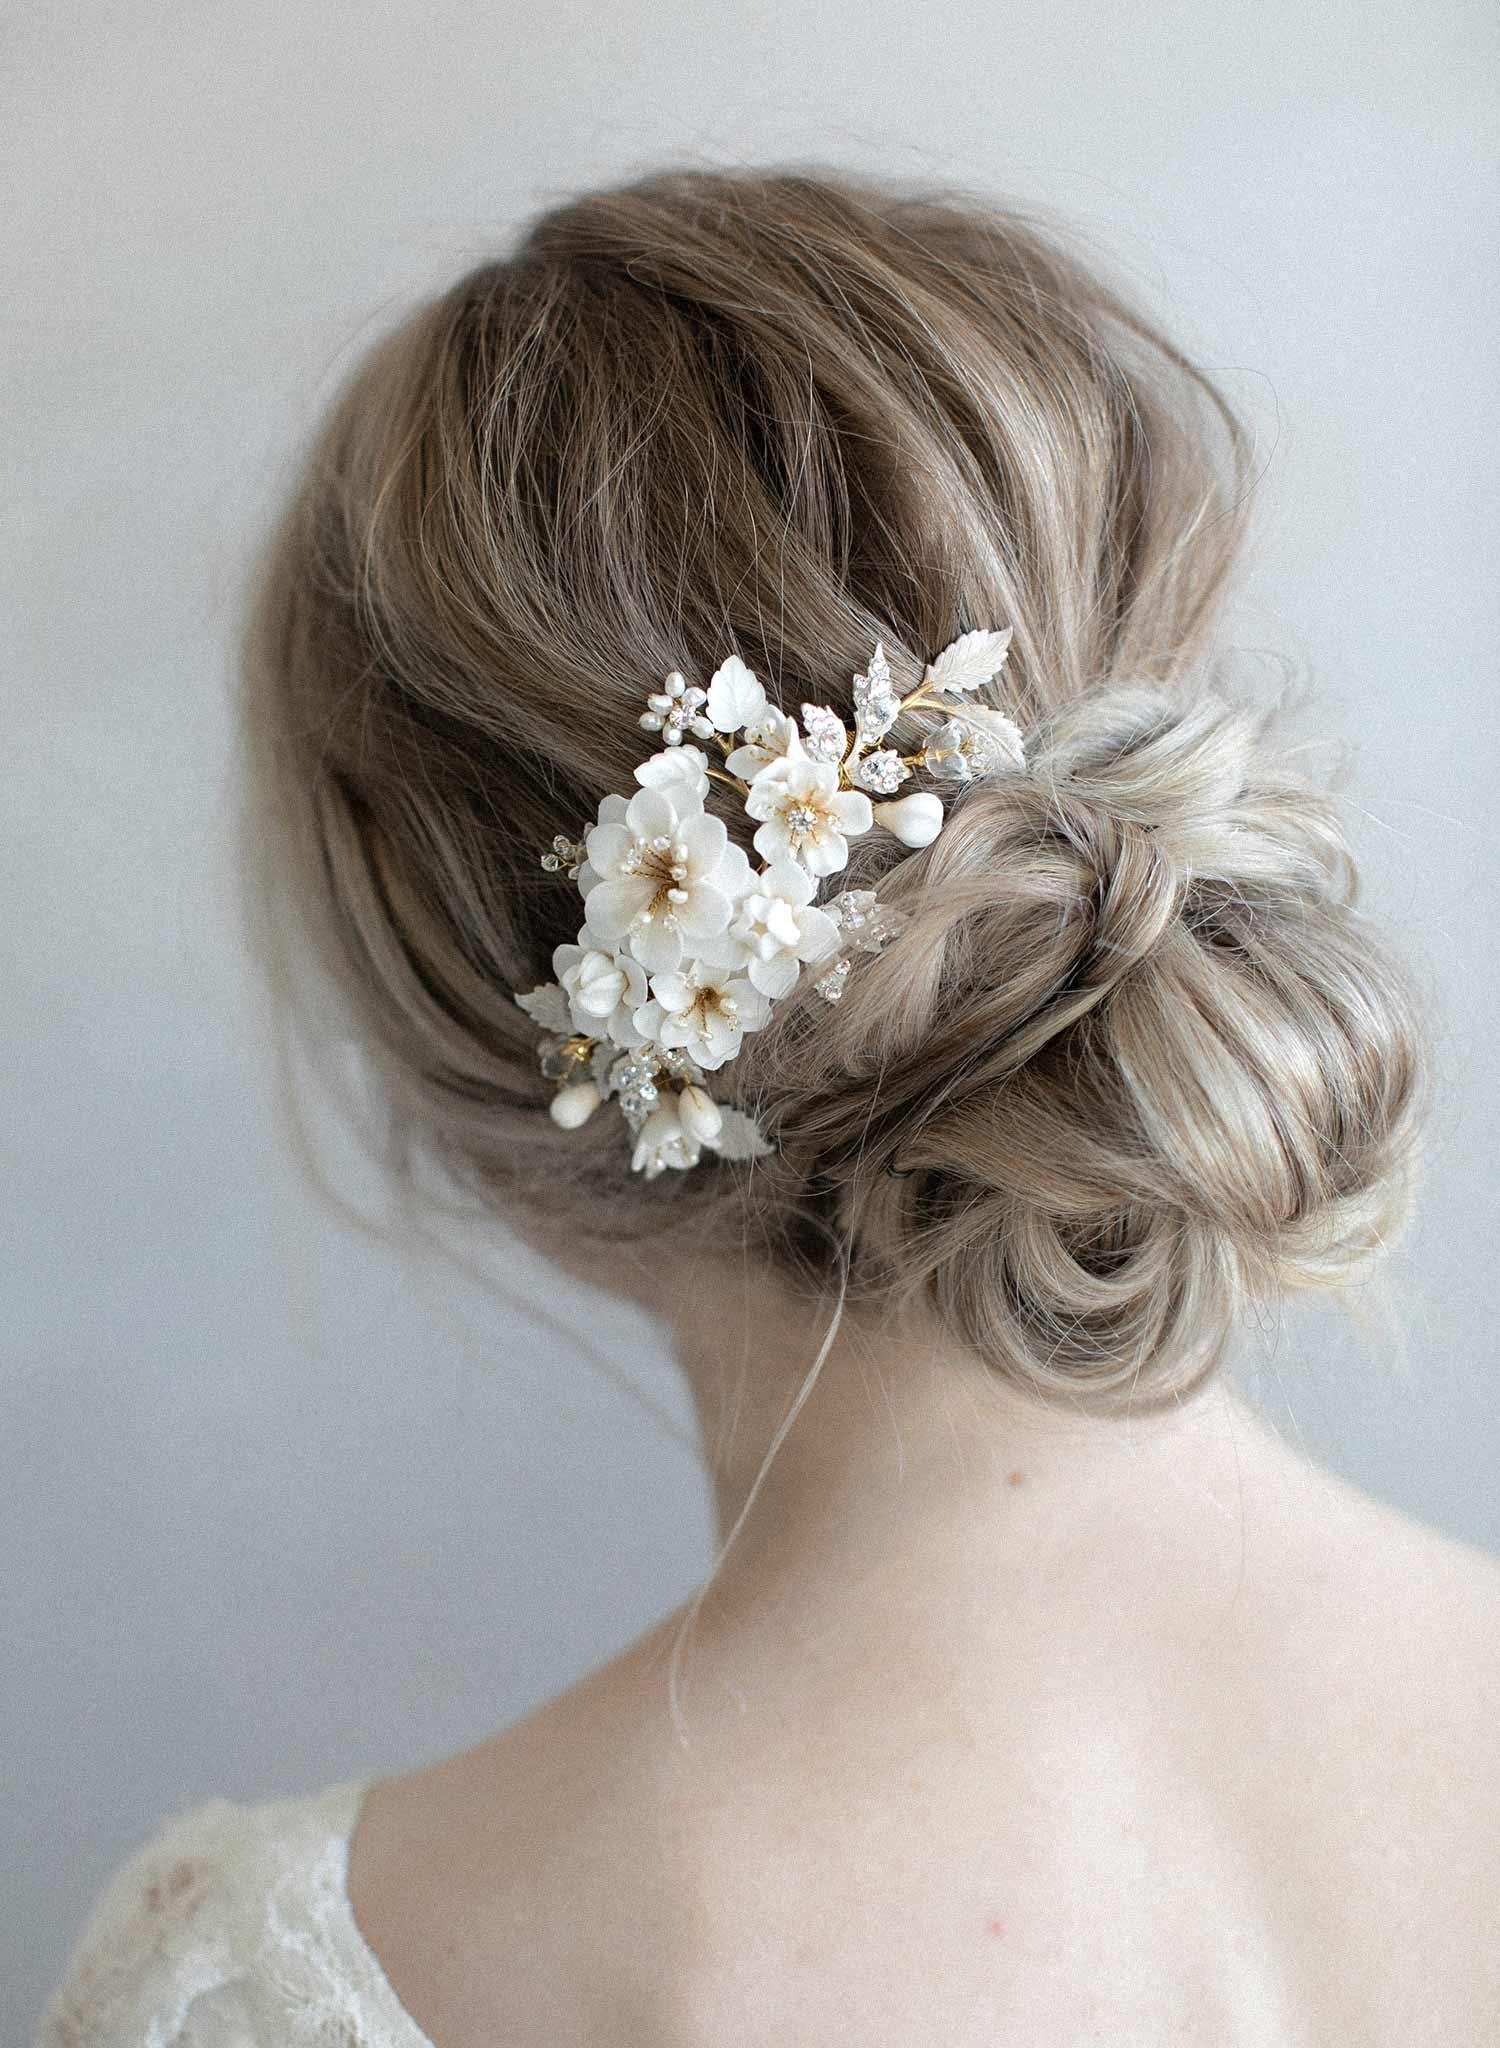 978-bridal-ivory-cream-hair-flowers-bridal-comb-headpiece-twigsandhoney_0008-MAIN.jpg